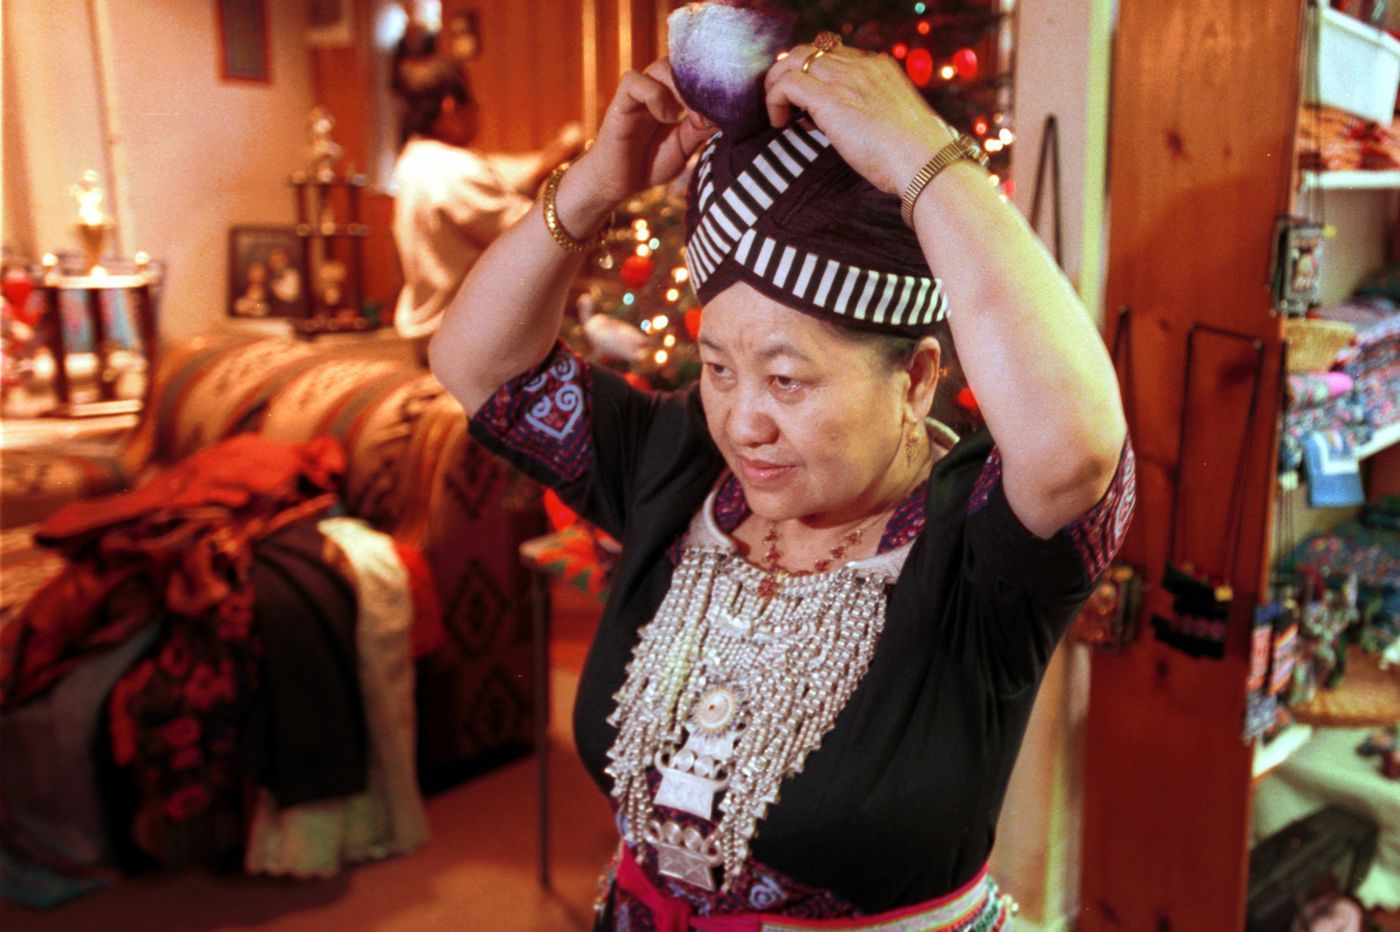 Pang Xiong Sirirathasuk Sikoun, Philadelphia artist and keeper of Hmong culture, dies at 76